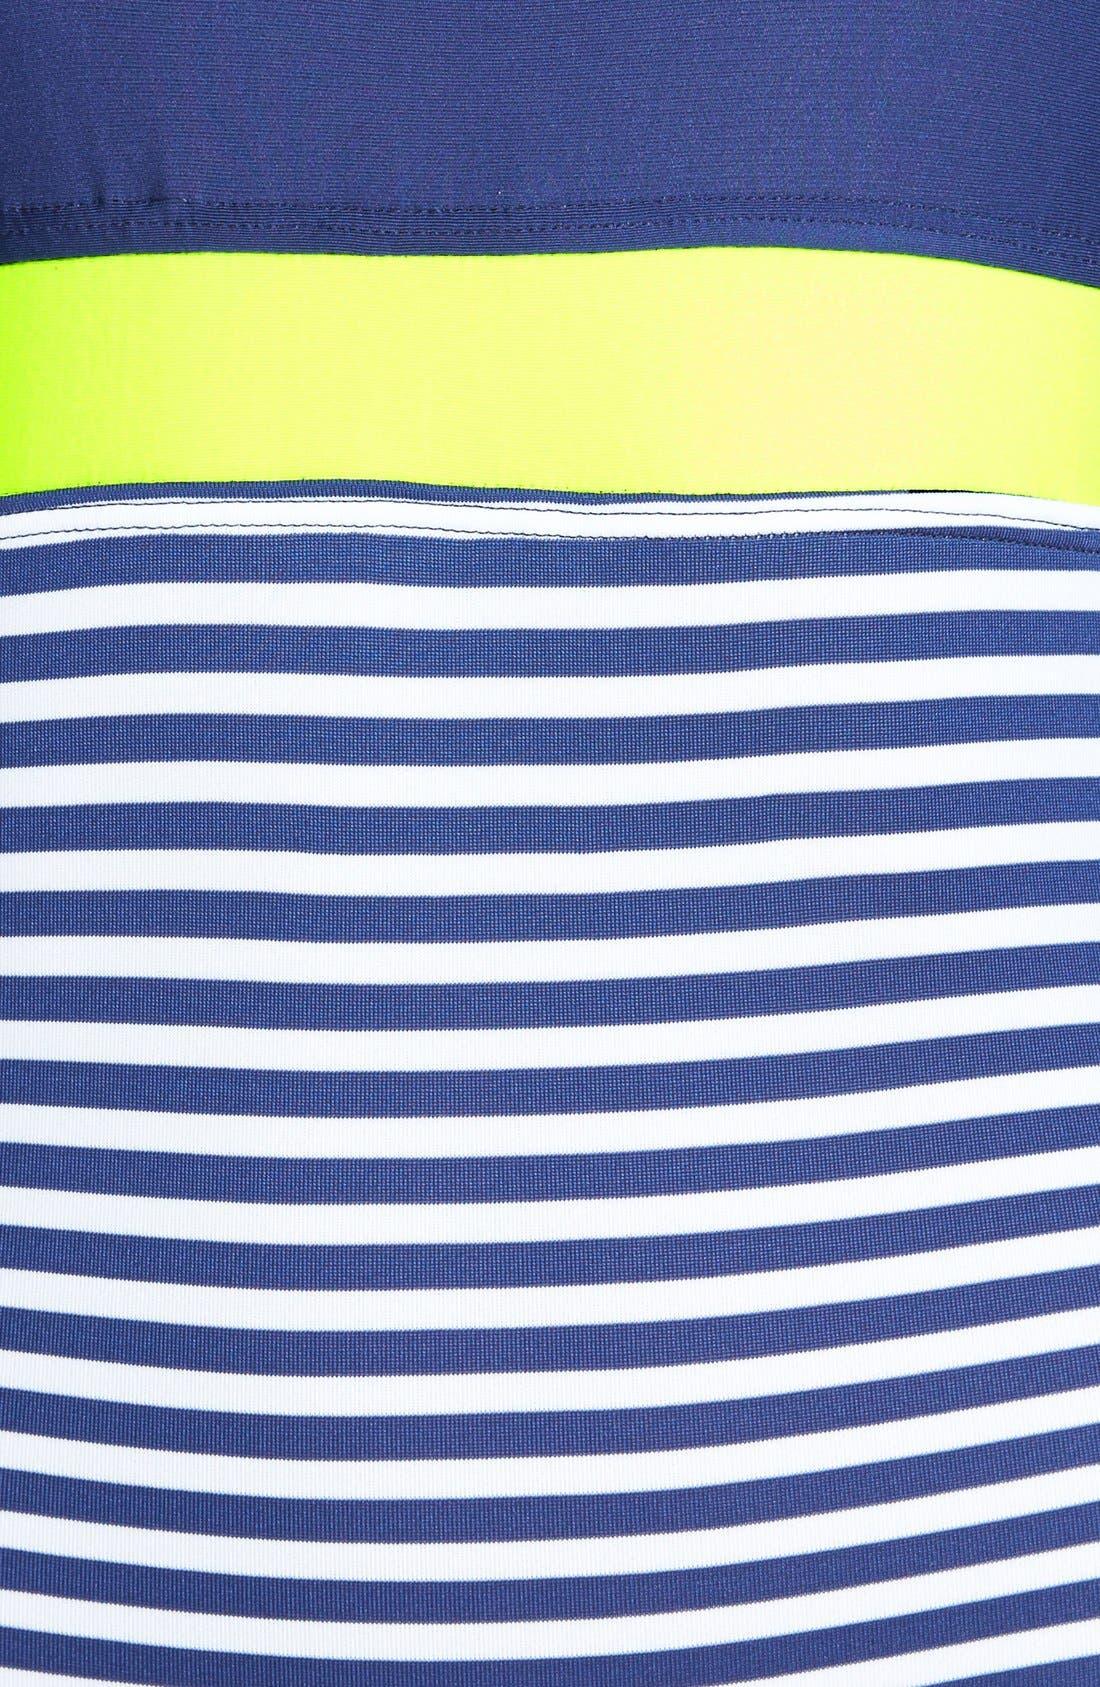 Alternate Image 3  - Splendid 'Malibu Stripe' Underwire Bandeau One-Piece Swimsuit